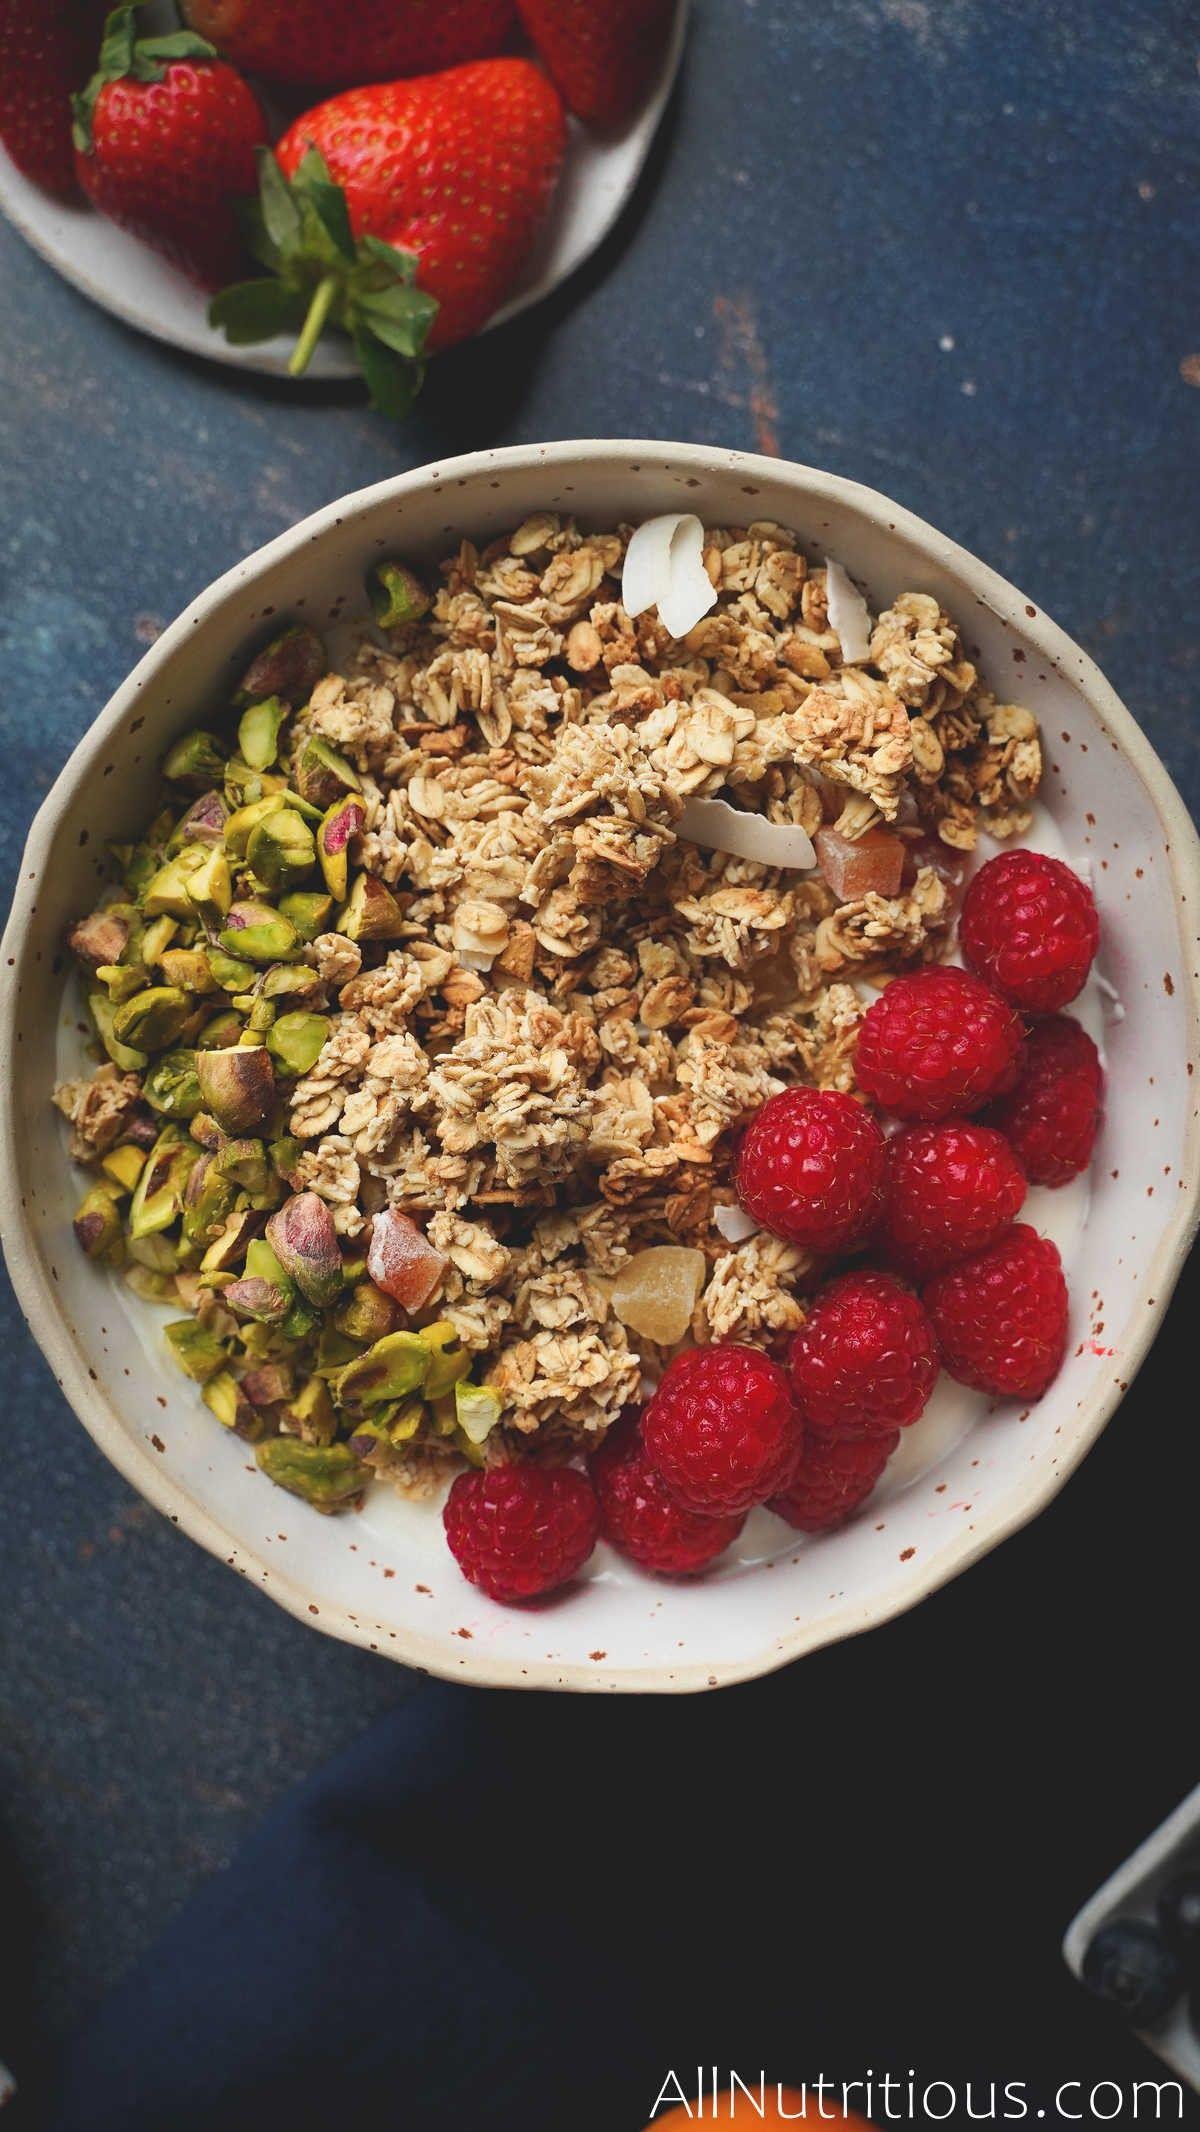 Raspberry & Pistachio Granola Bowl